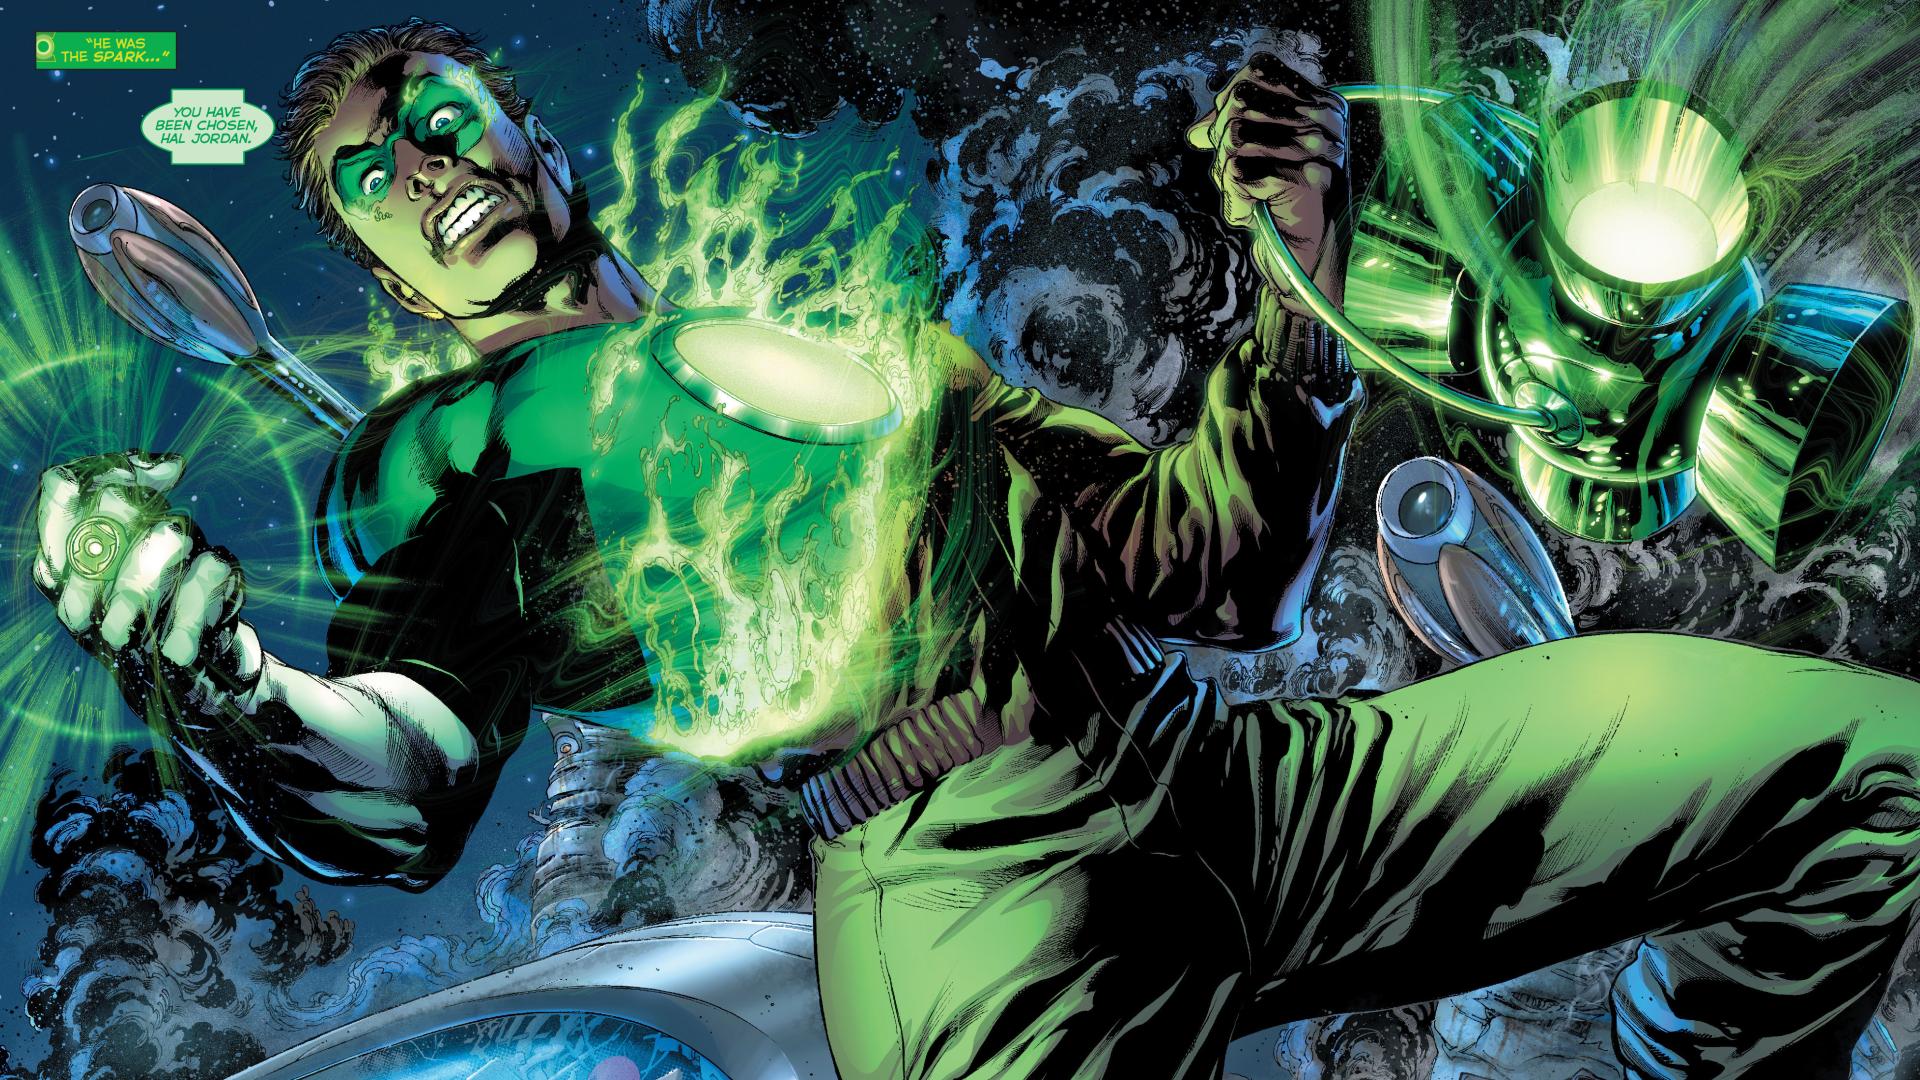 Green Lantern Comic Wallpaper: Green Lantern Computer Wallpapers, Desktop Backgrounds